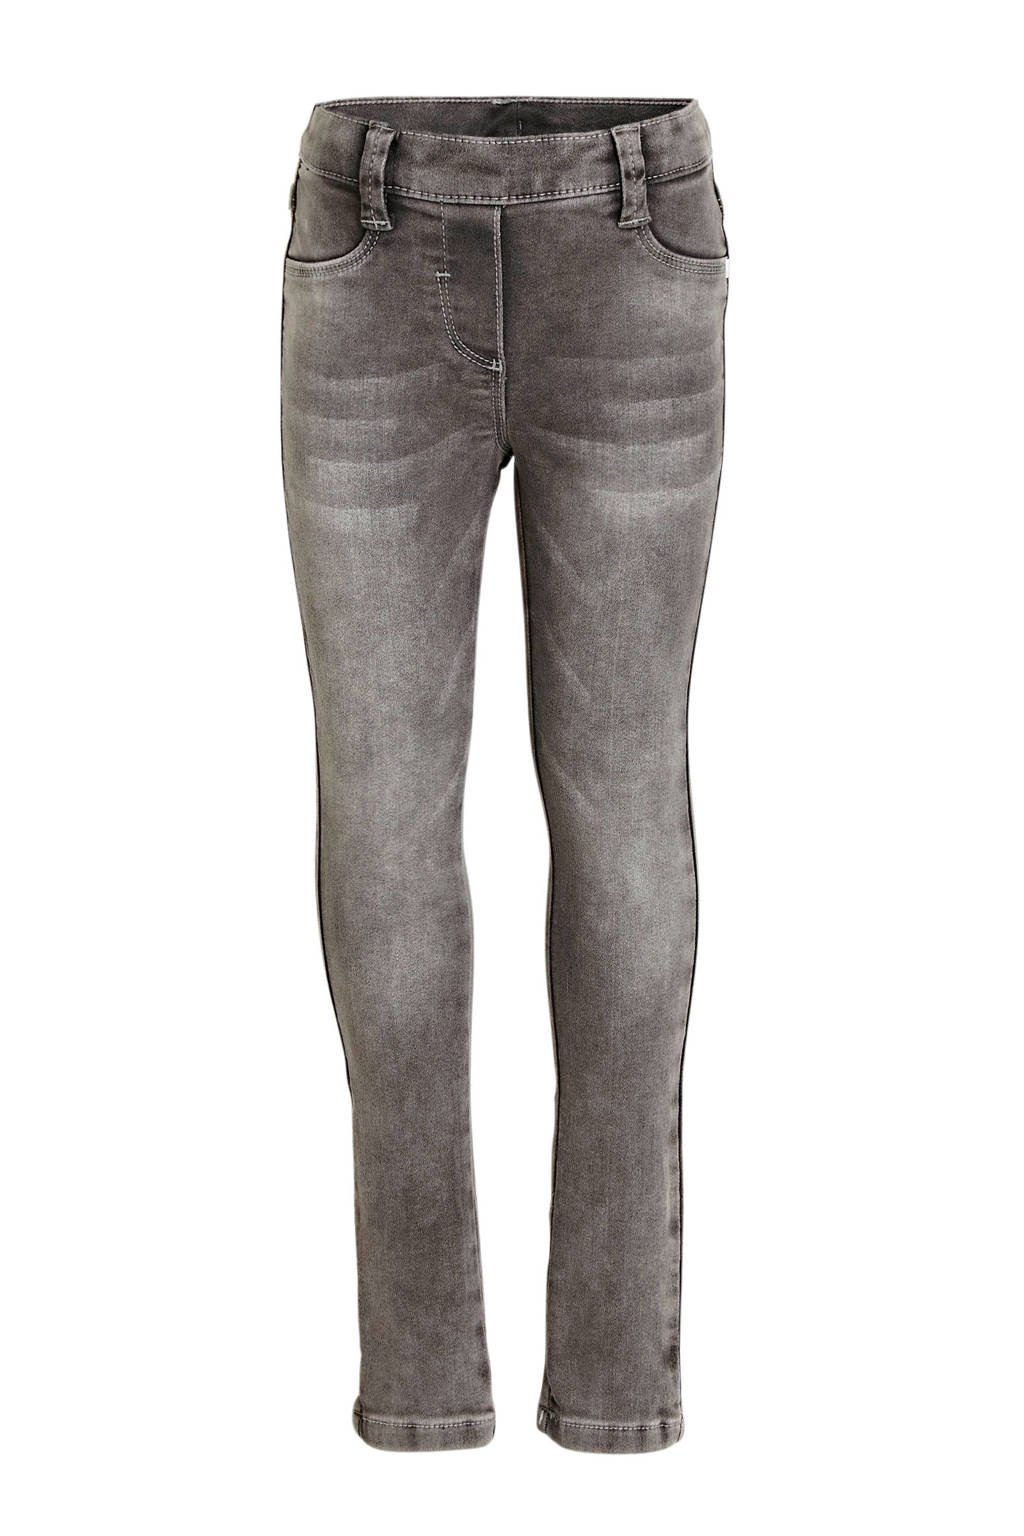 s.Oliver skinny jeans grijs stonewashed, Grijs stonewashed